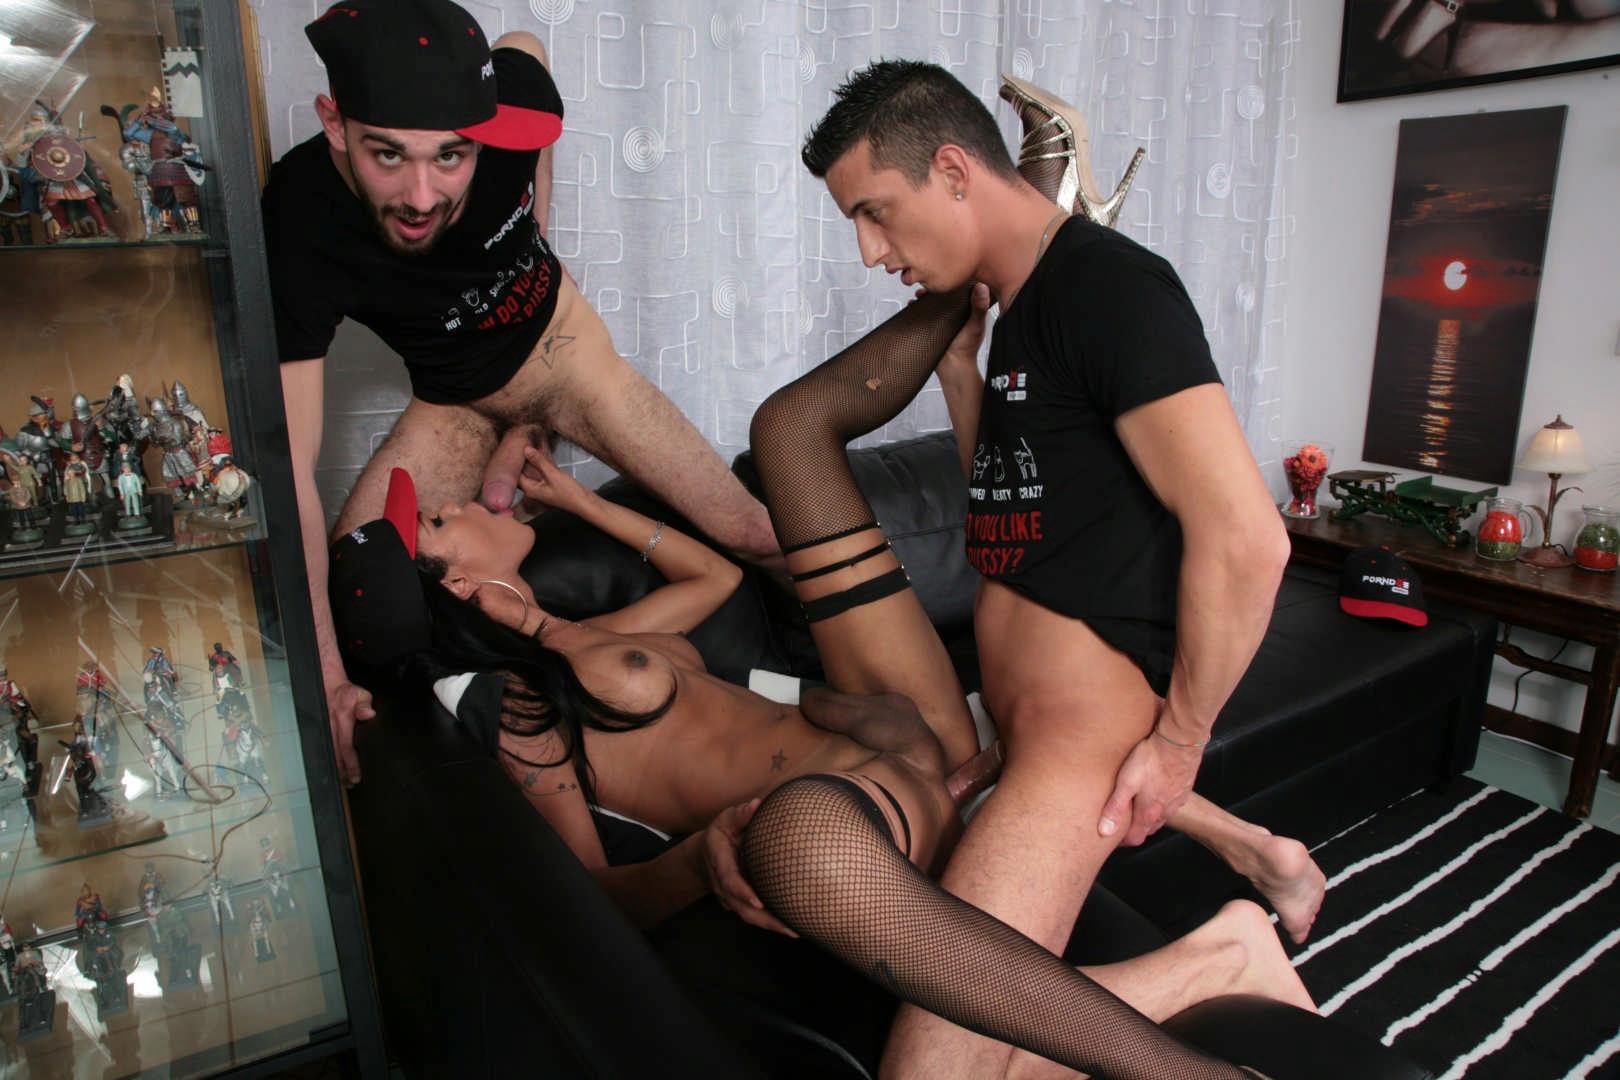 Latina_Tgirl_Priscylla_Modella_Enjoys_Two_Cocks_In_Steamy_Threesome1_3777-by-am.jpg